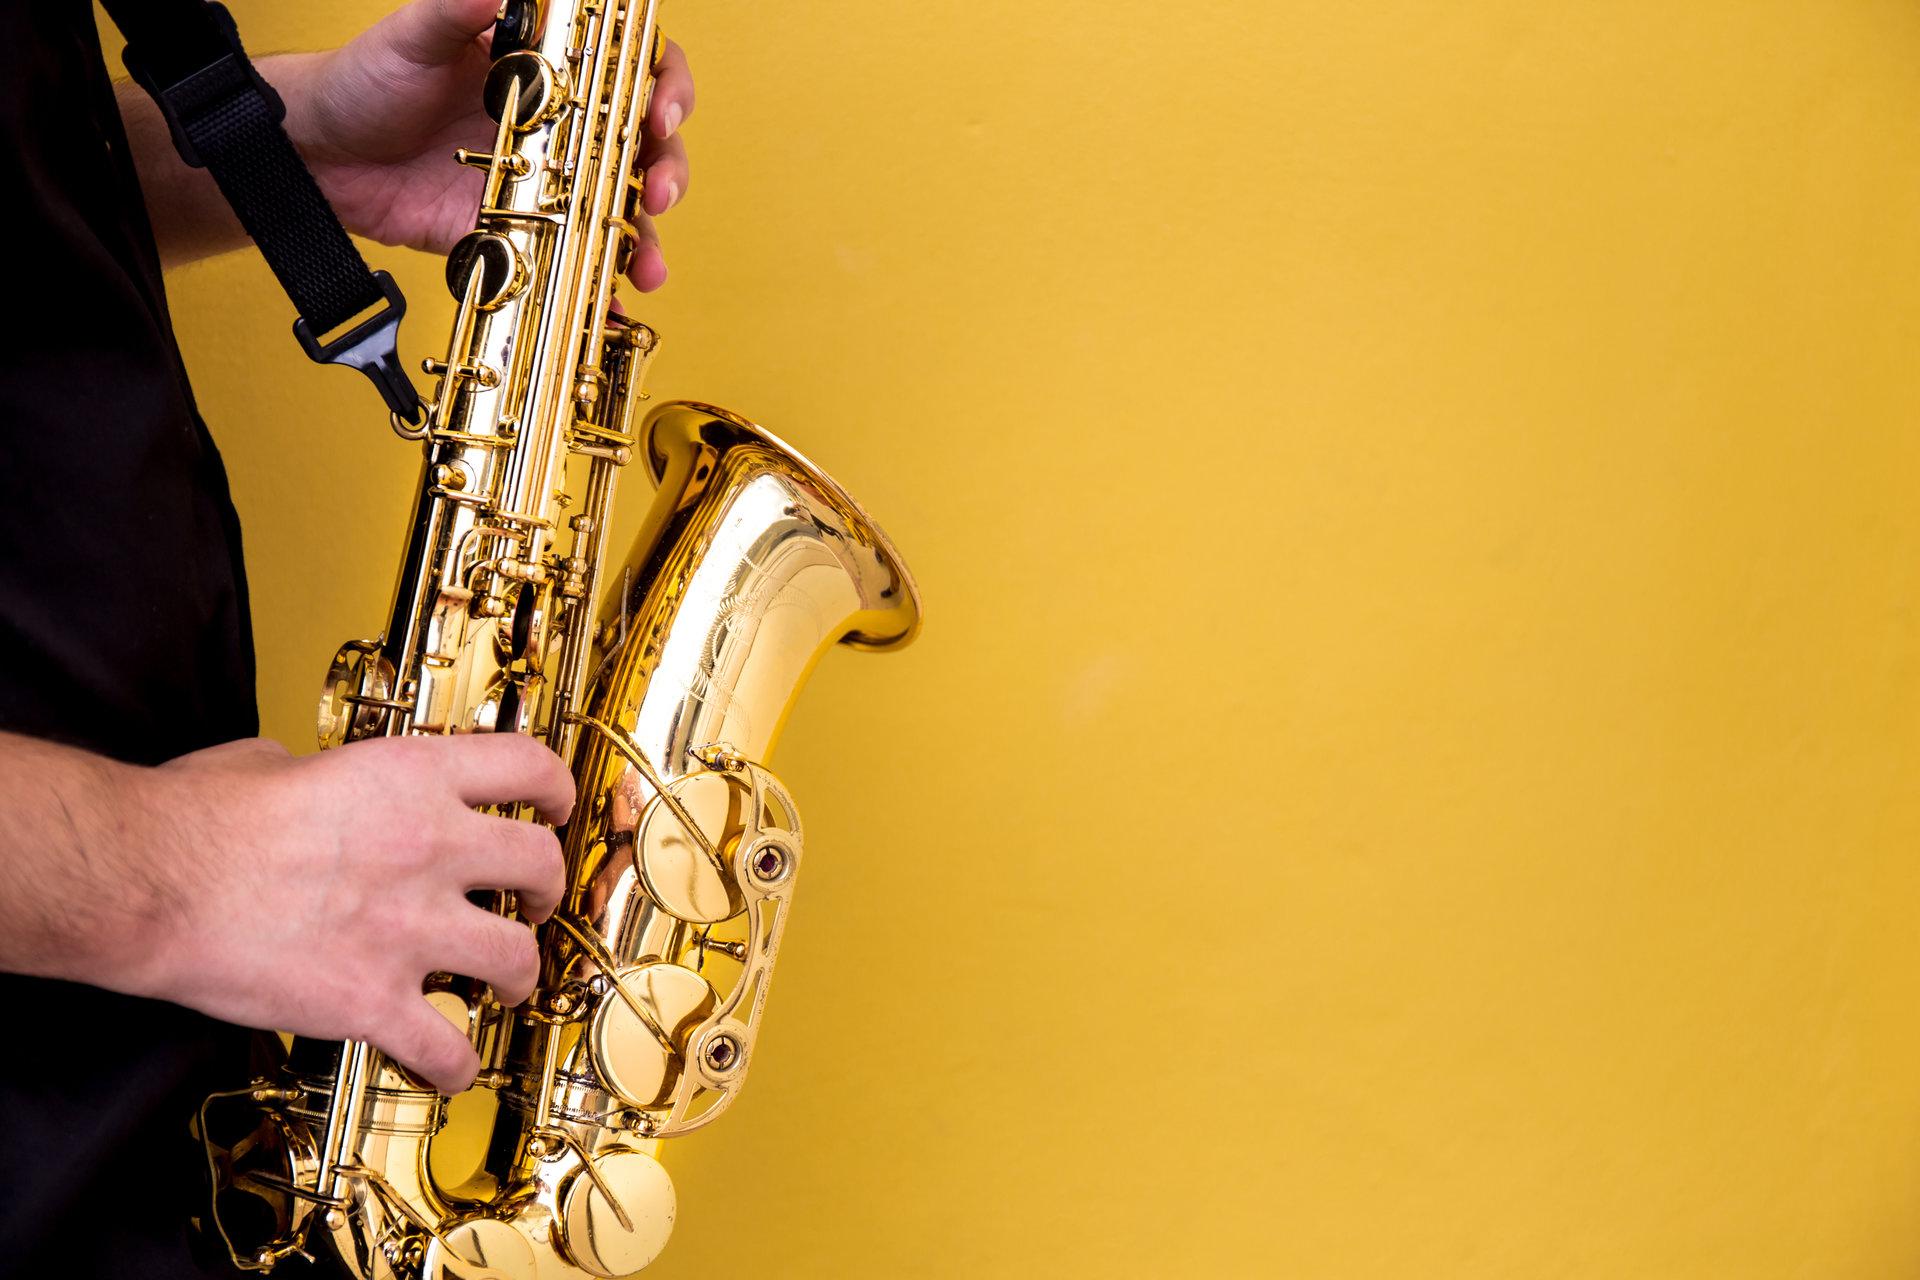 saxofon; instrument muzical; simbol pentru meserii din domeniul artistic (muzical)